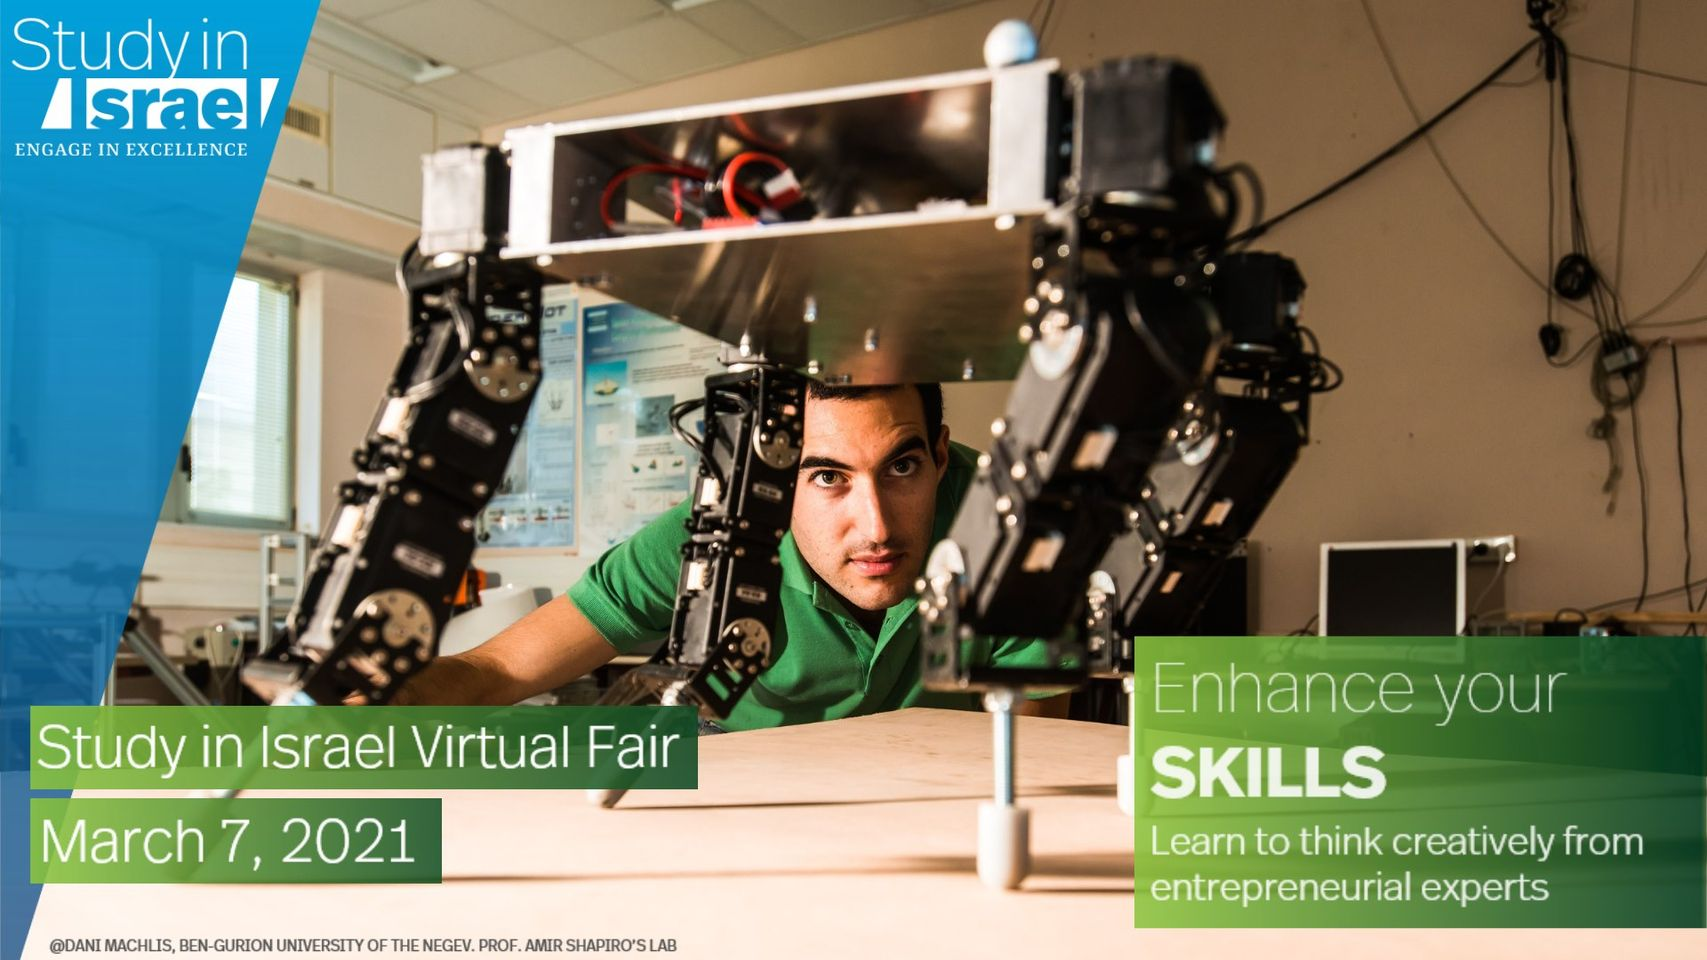 Study in Israel Virtual Fair